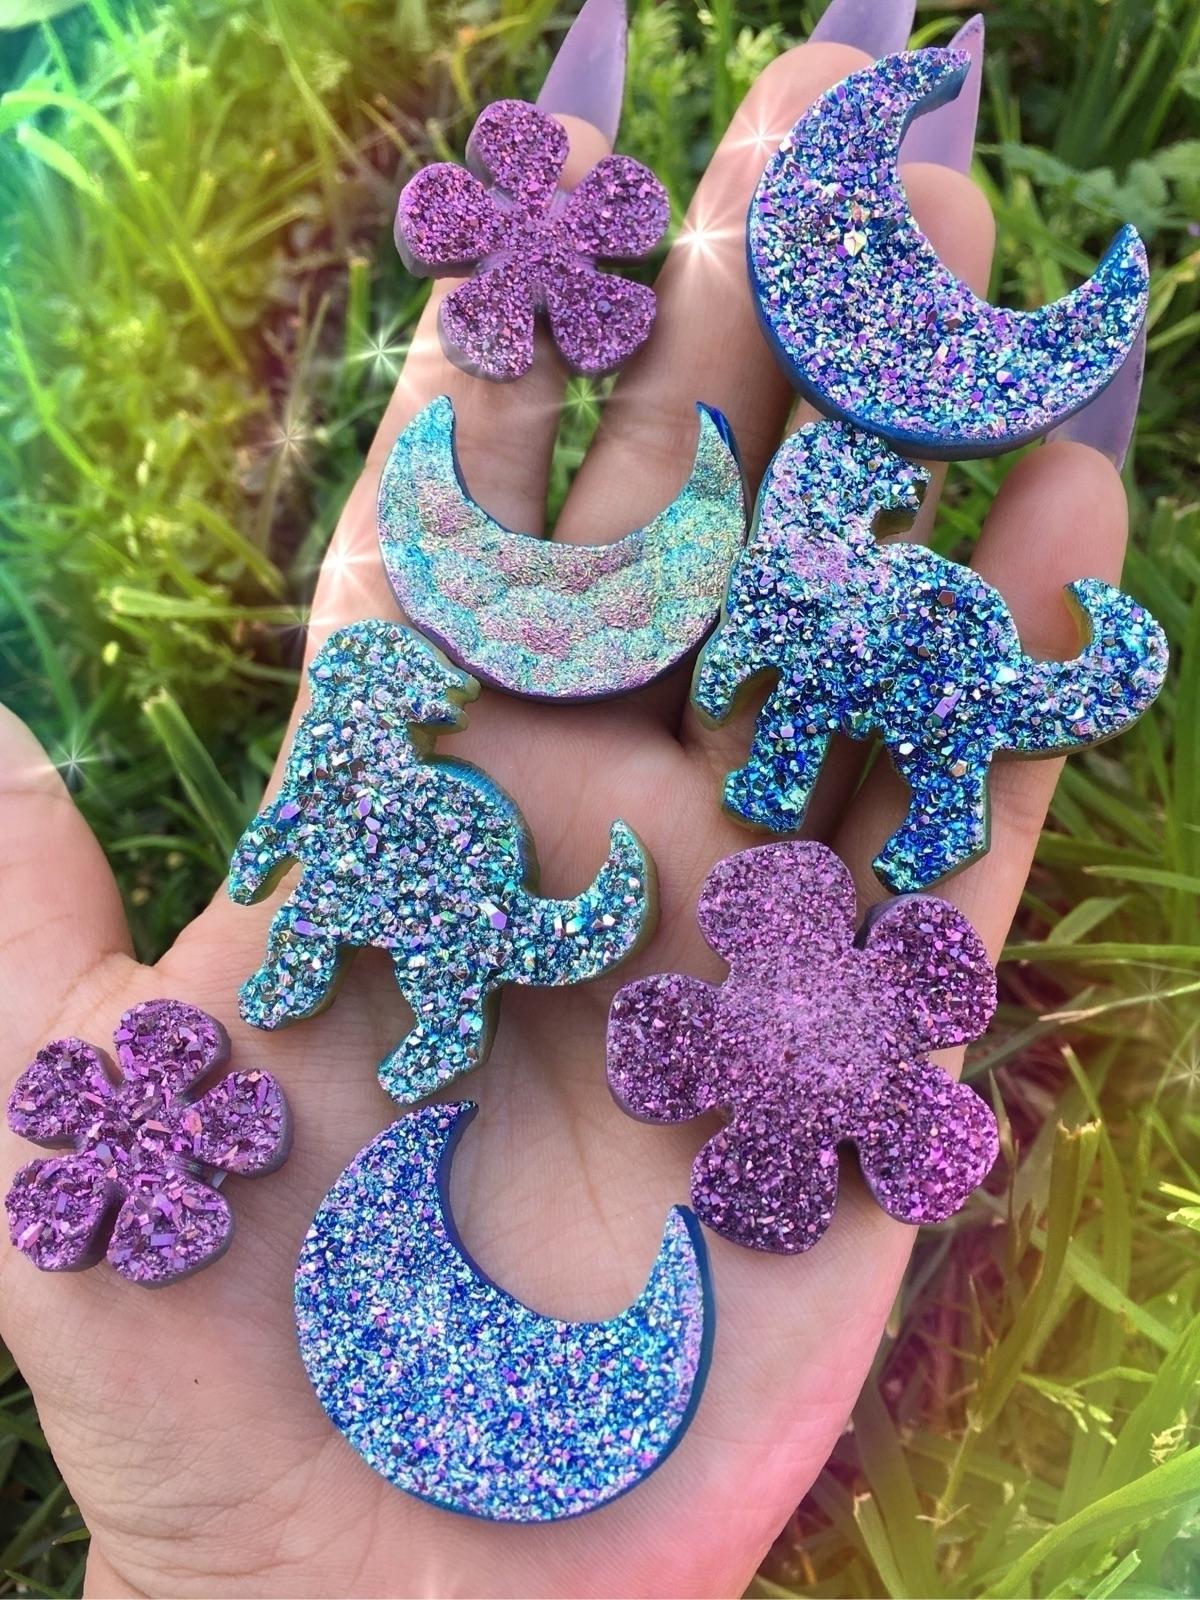 Aura druzzy shapes - crystals, auracrystals - prismsouls | ello